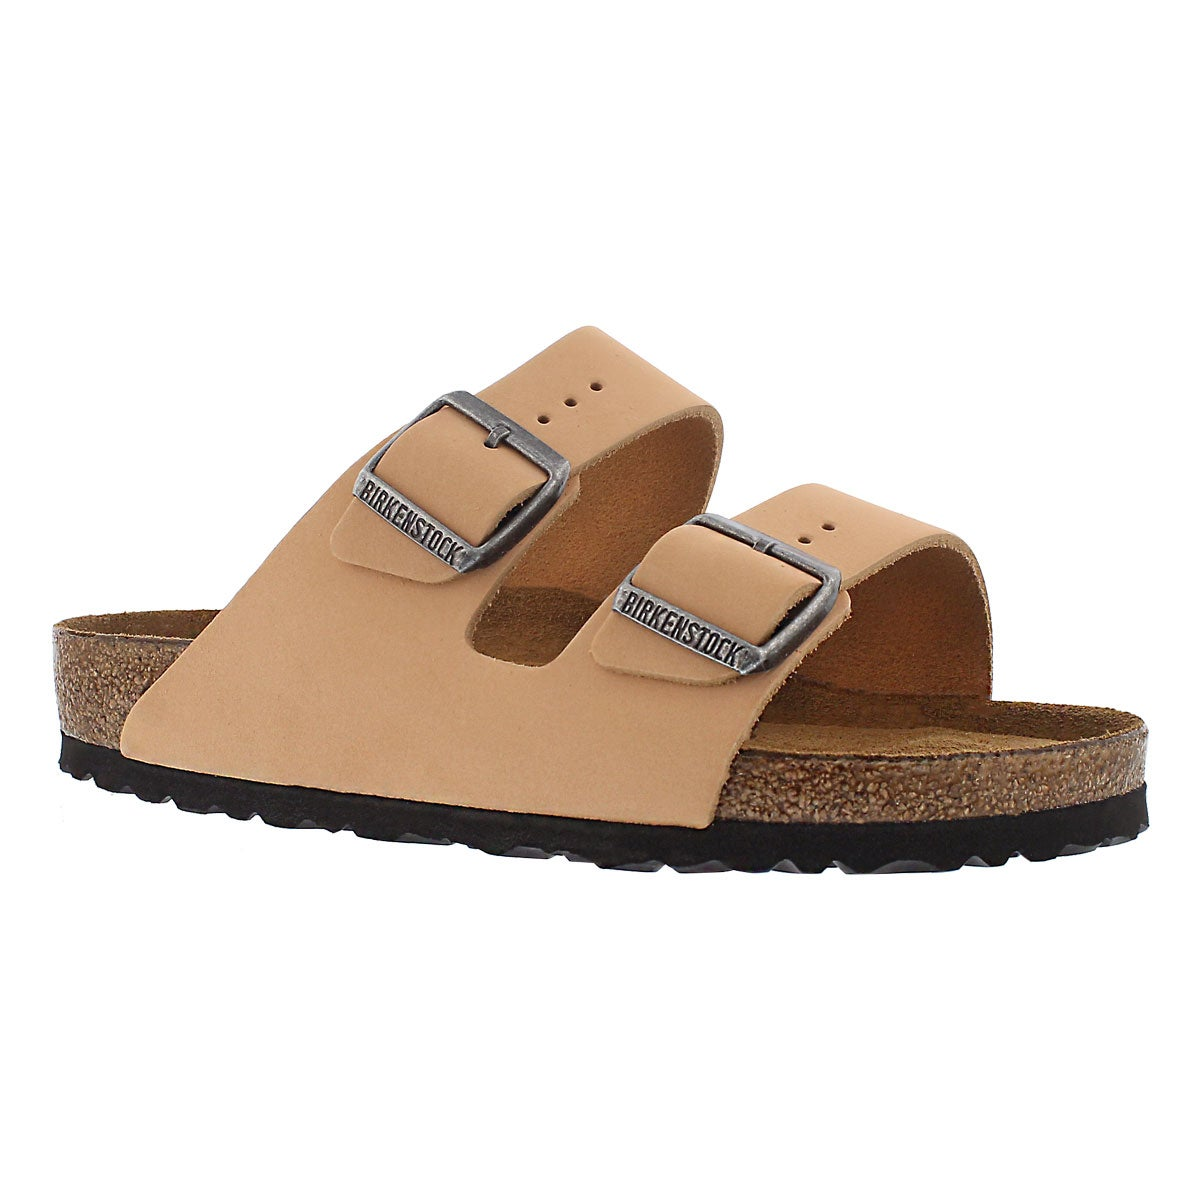 Lds Arizona sand 2 strap sandal - SF